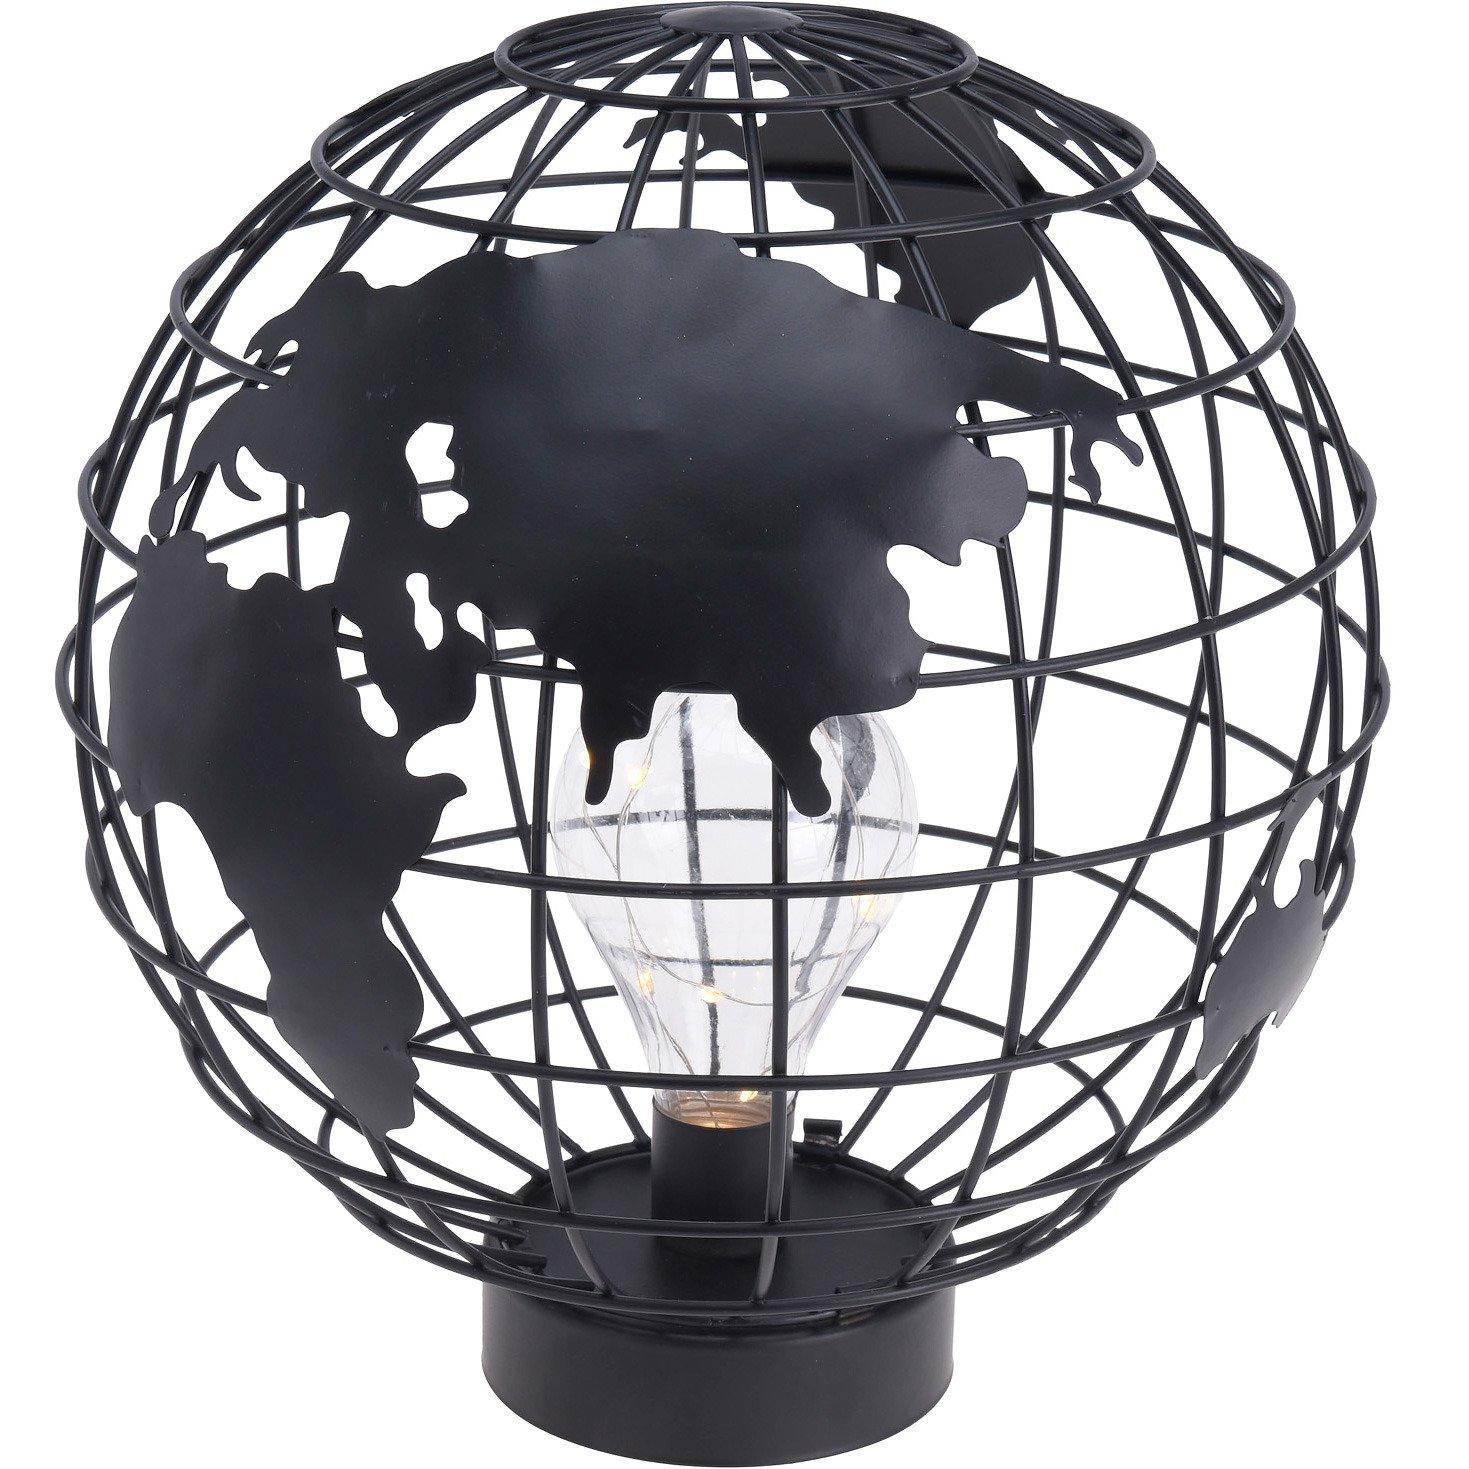 Globus Lampe Schwarz